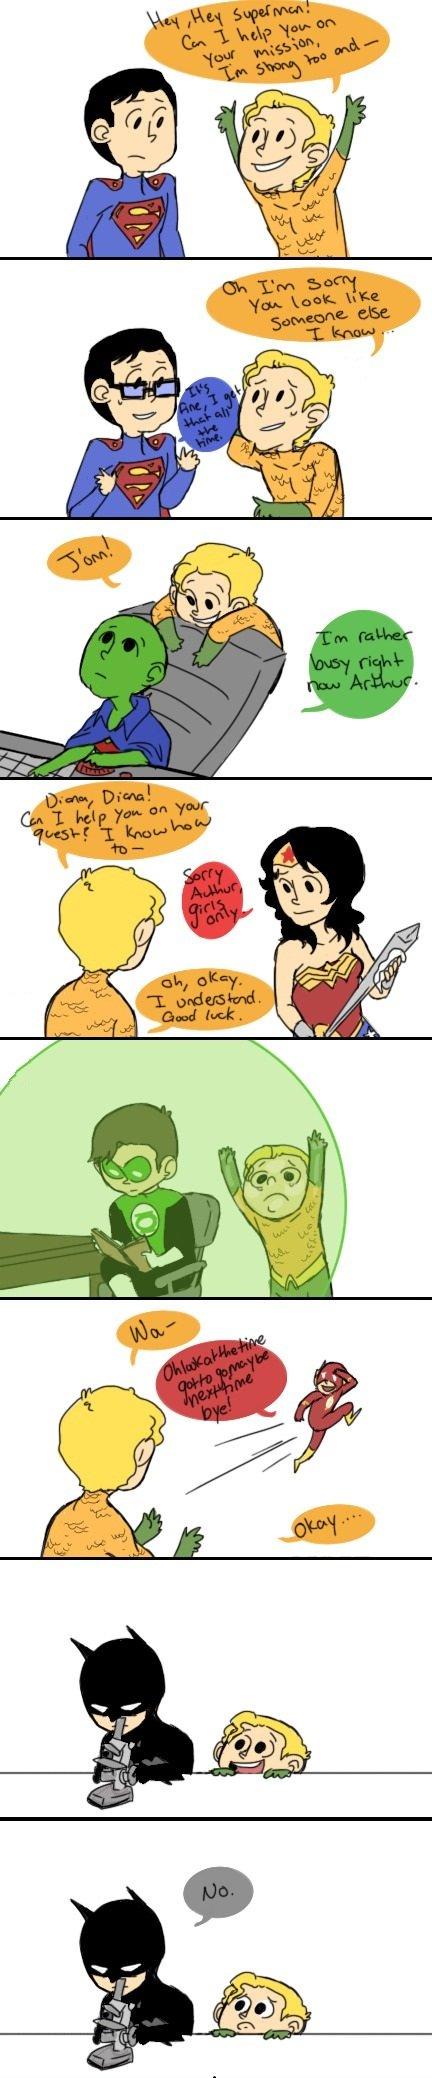 poor aquaman.... mild feels.. Who's useless? superheroes